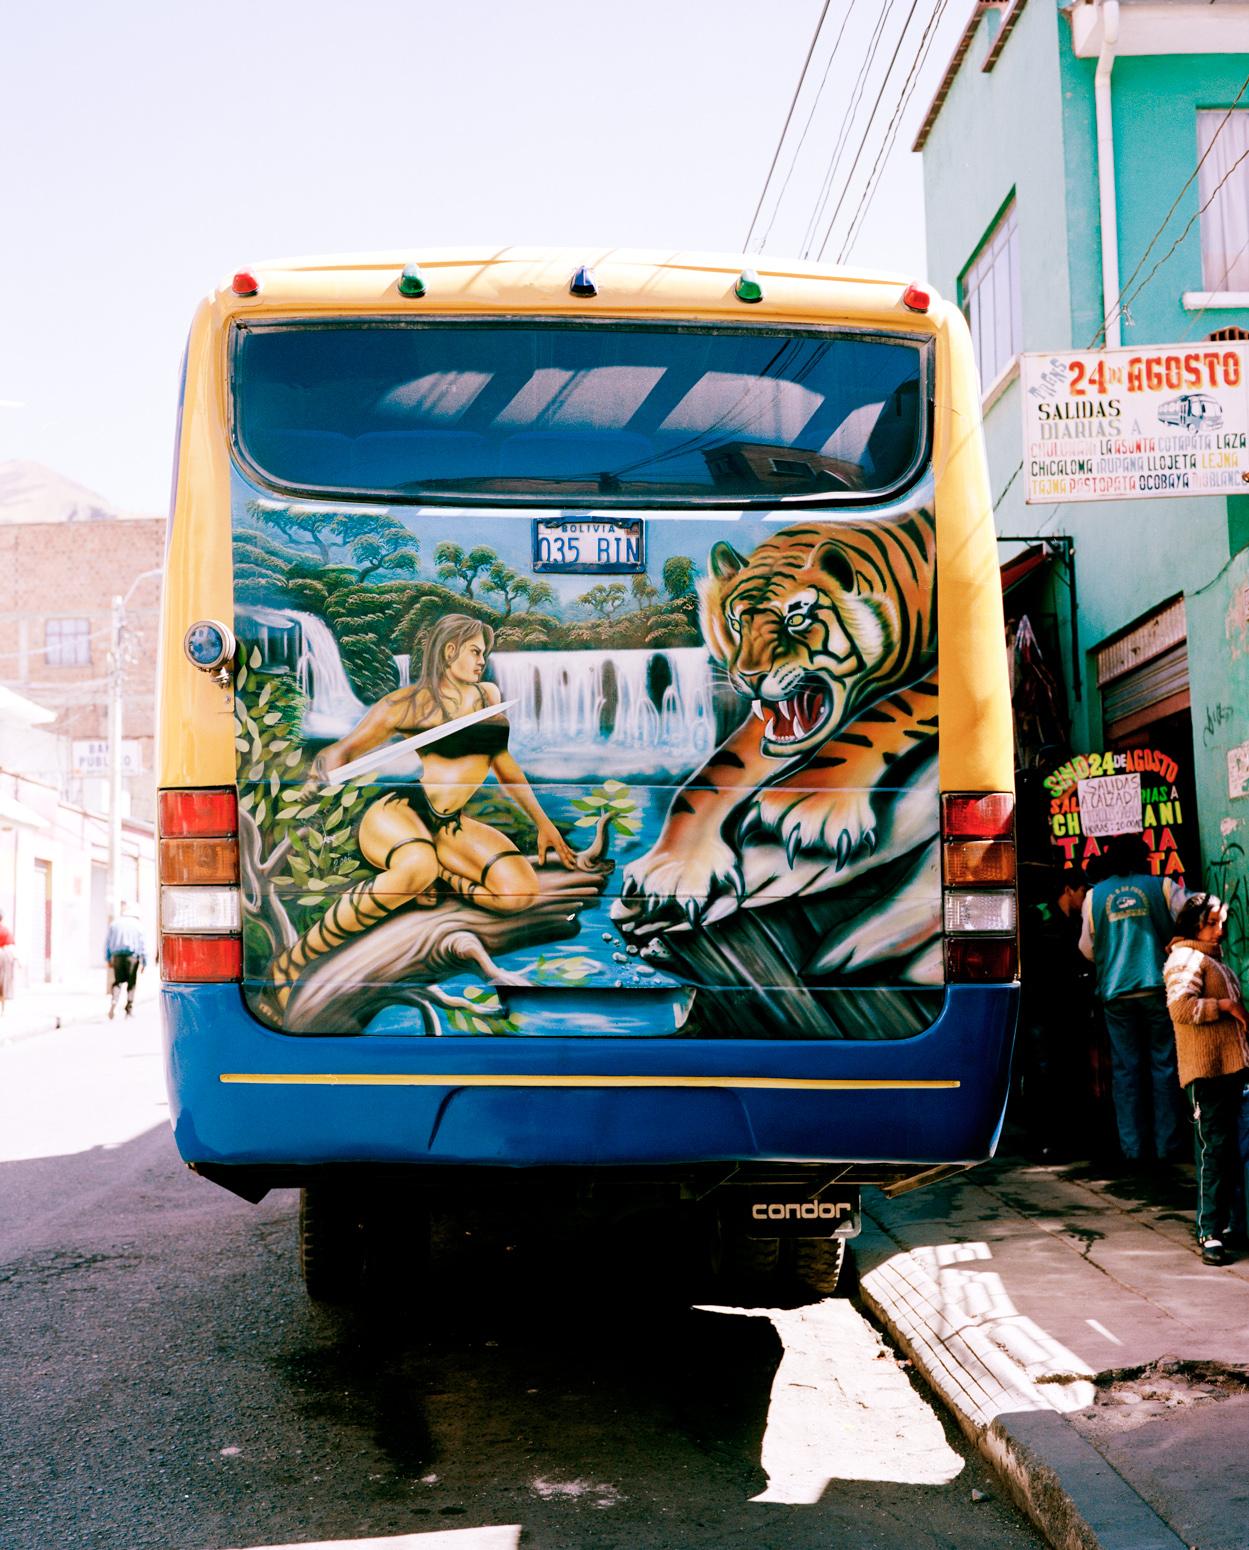 Daniel_Hofer_Bolivian_Busses_97_09_1550PX_WEB.jpg